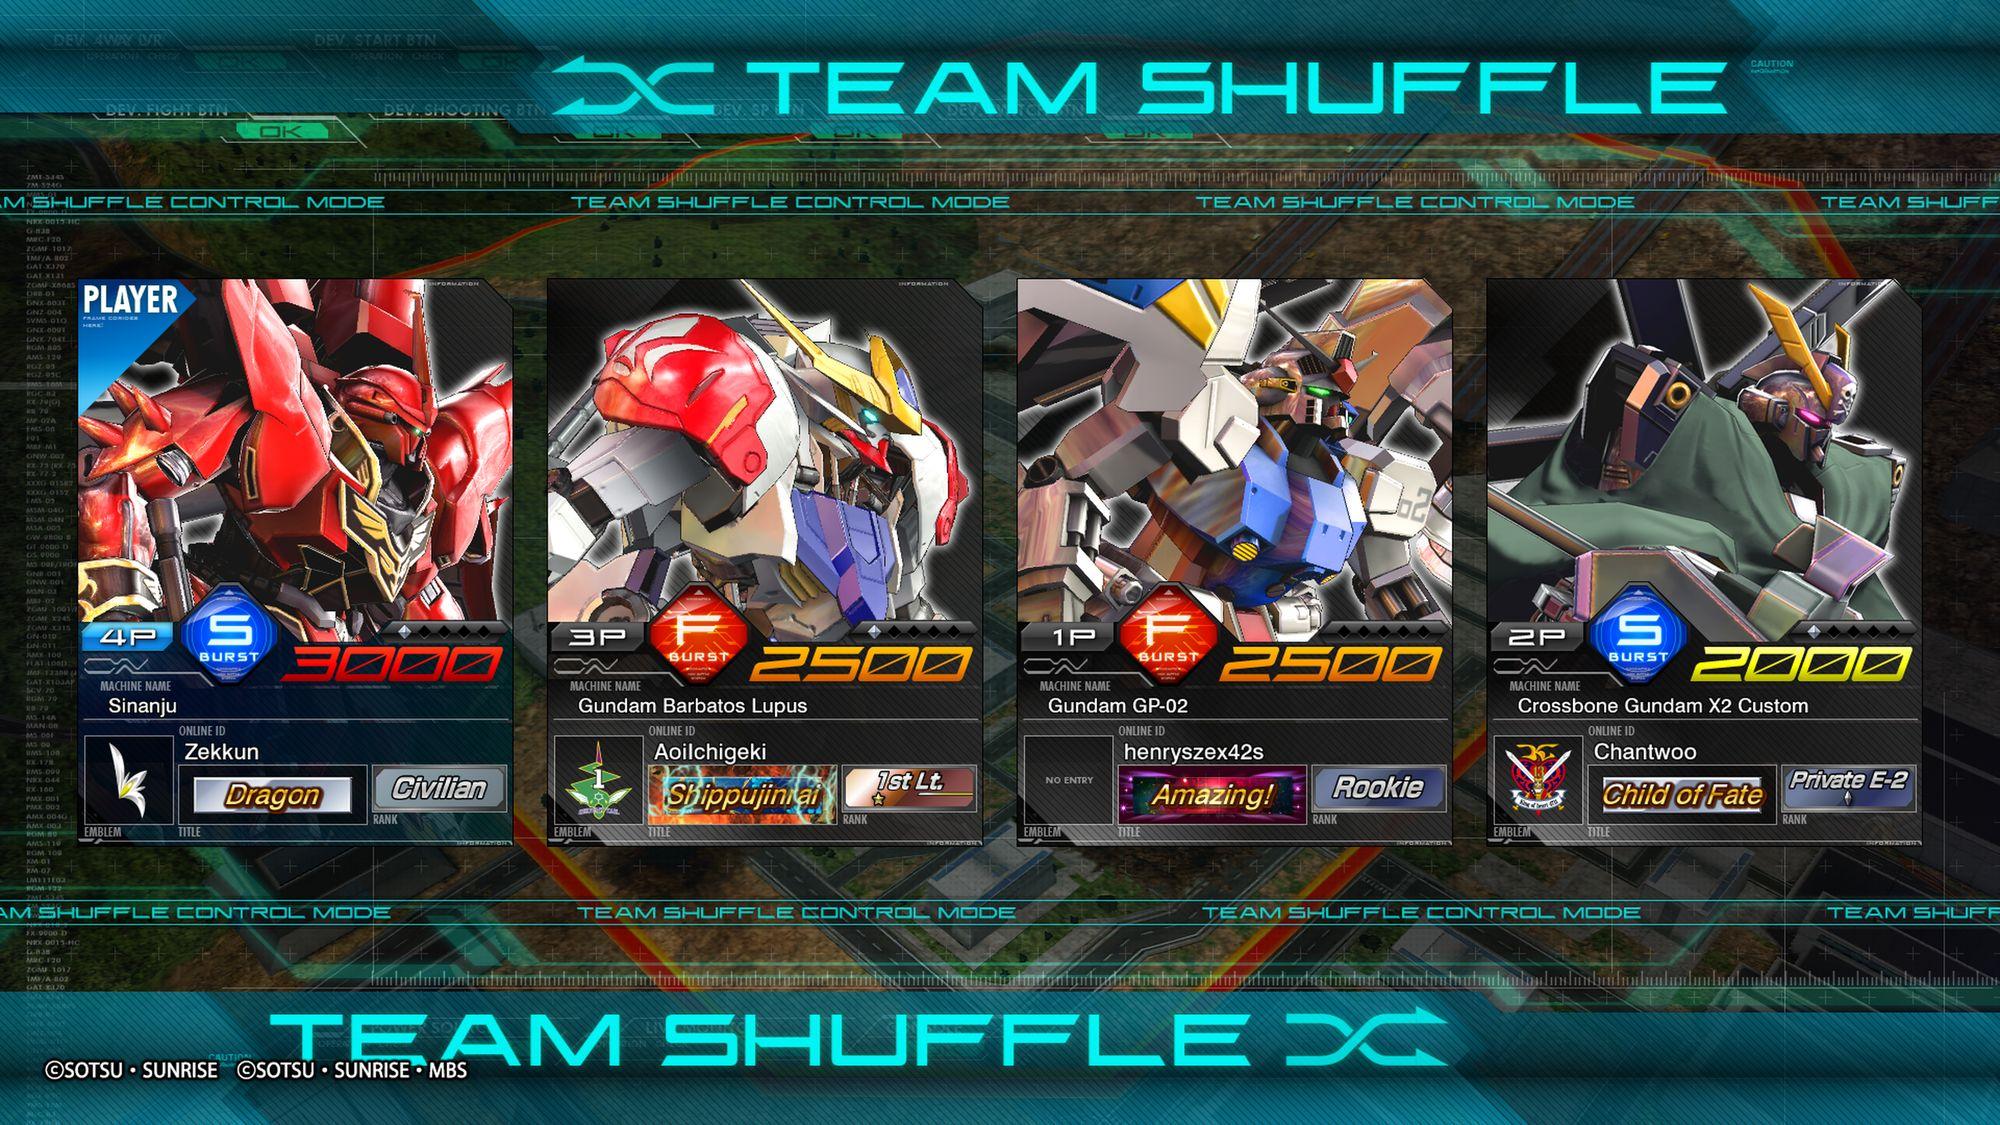 Team Shuffle - MOBILE SUIT GUNDAM EXTREME VS. MAXIBOOST ON